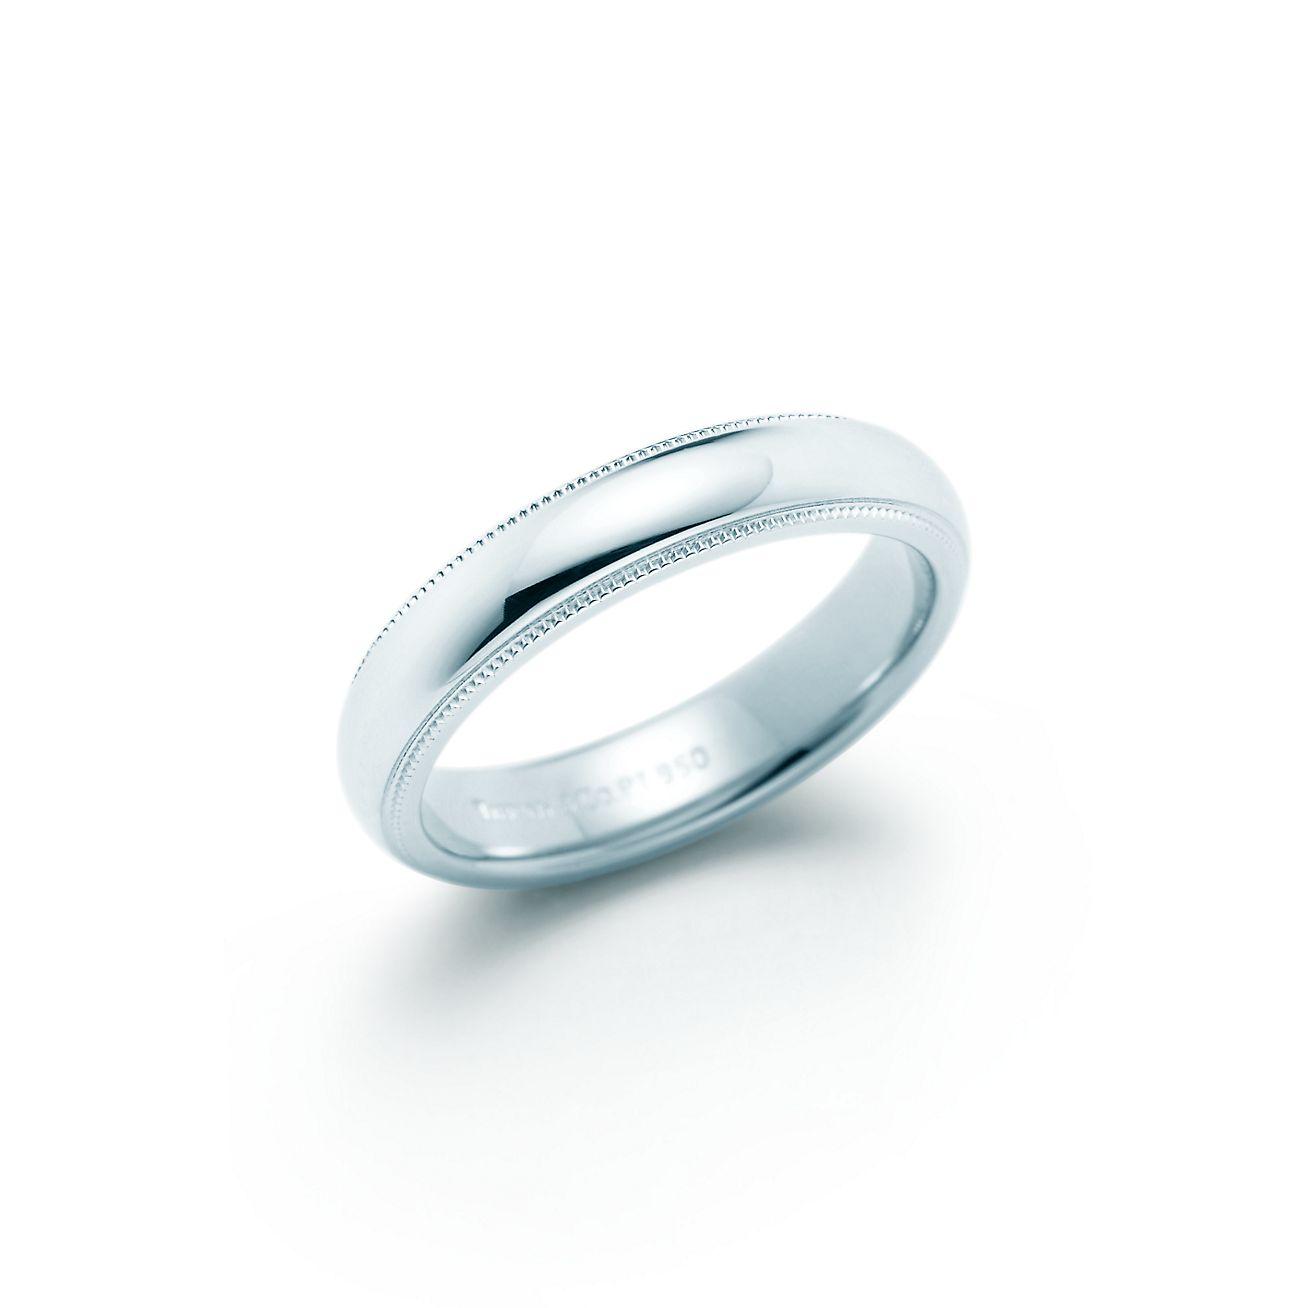 Tiffany Clic Milgrain Wedding Br Band